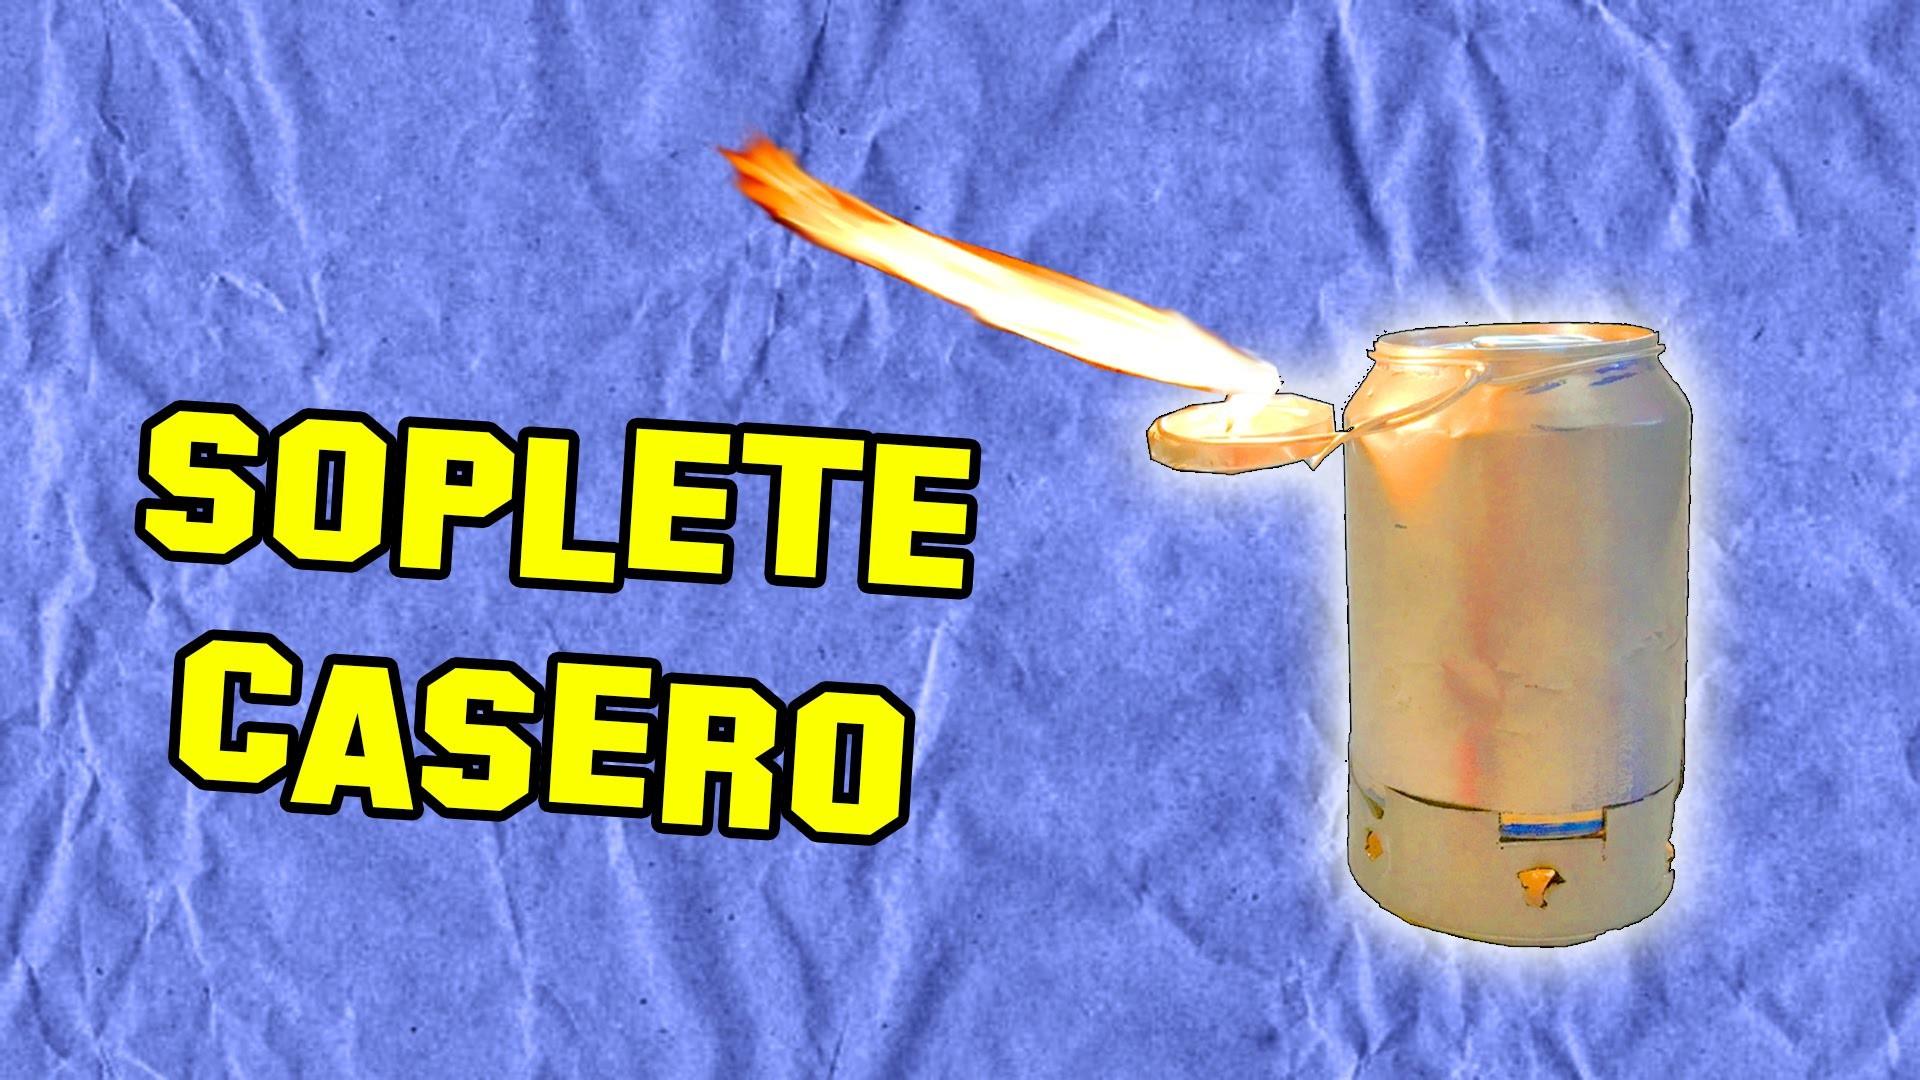 Como Hacer un Soplete Casero | How to Make a Blowtorch